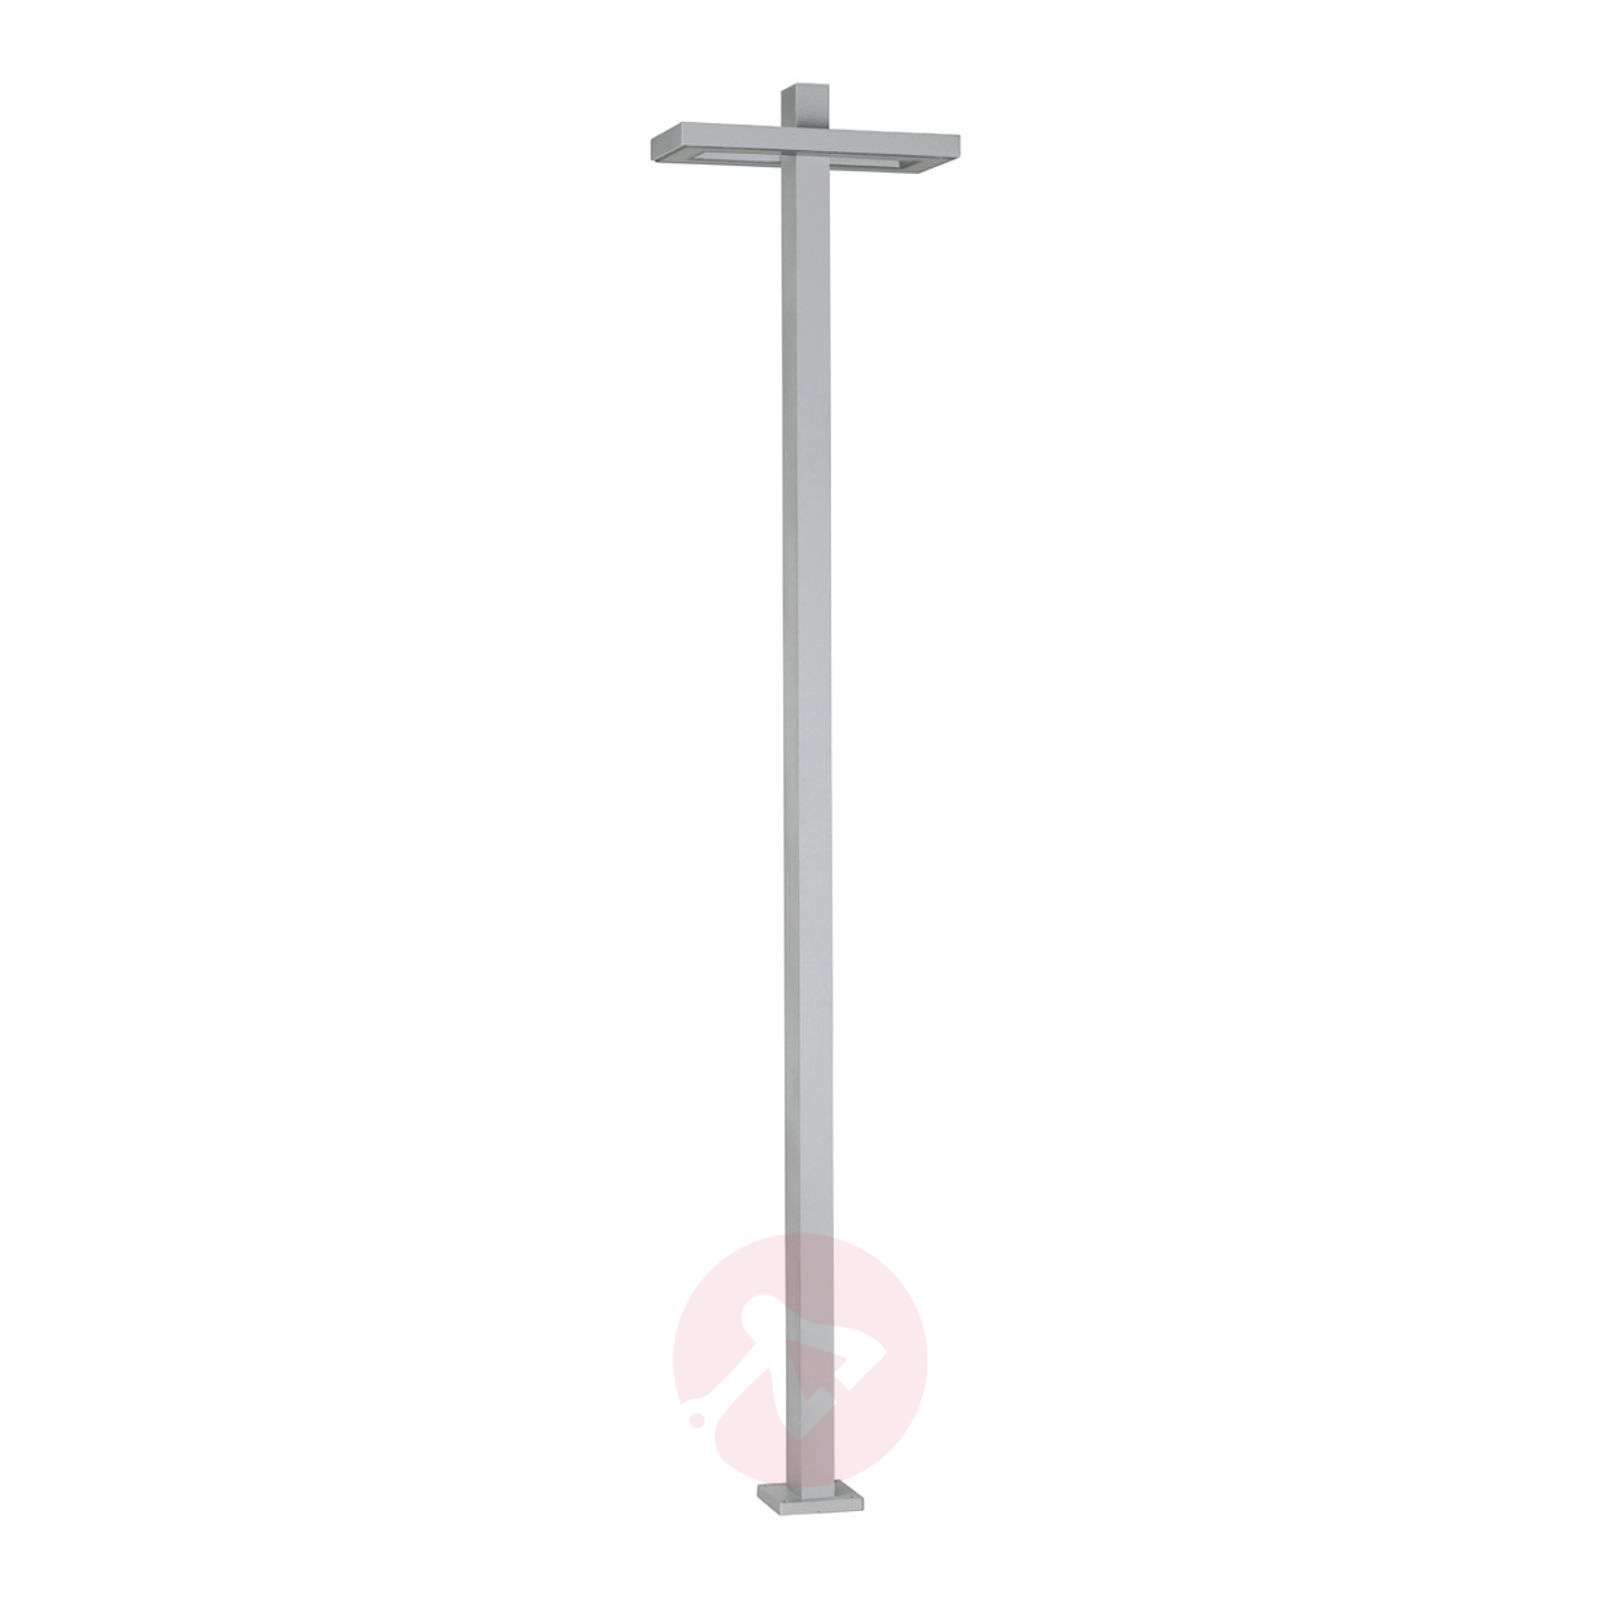 Korkea Rectangle-lyhtypylväs-4000206X-01